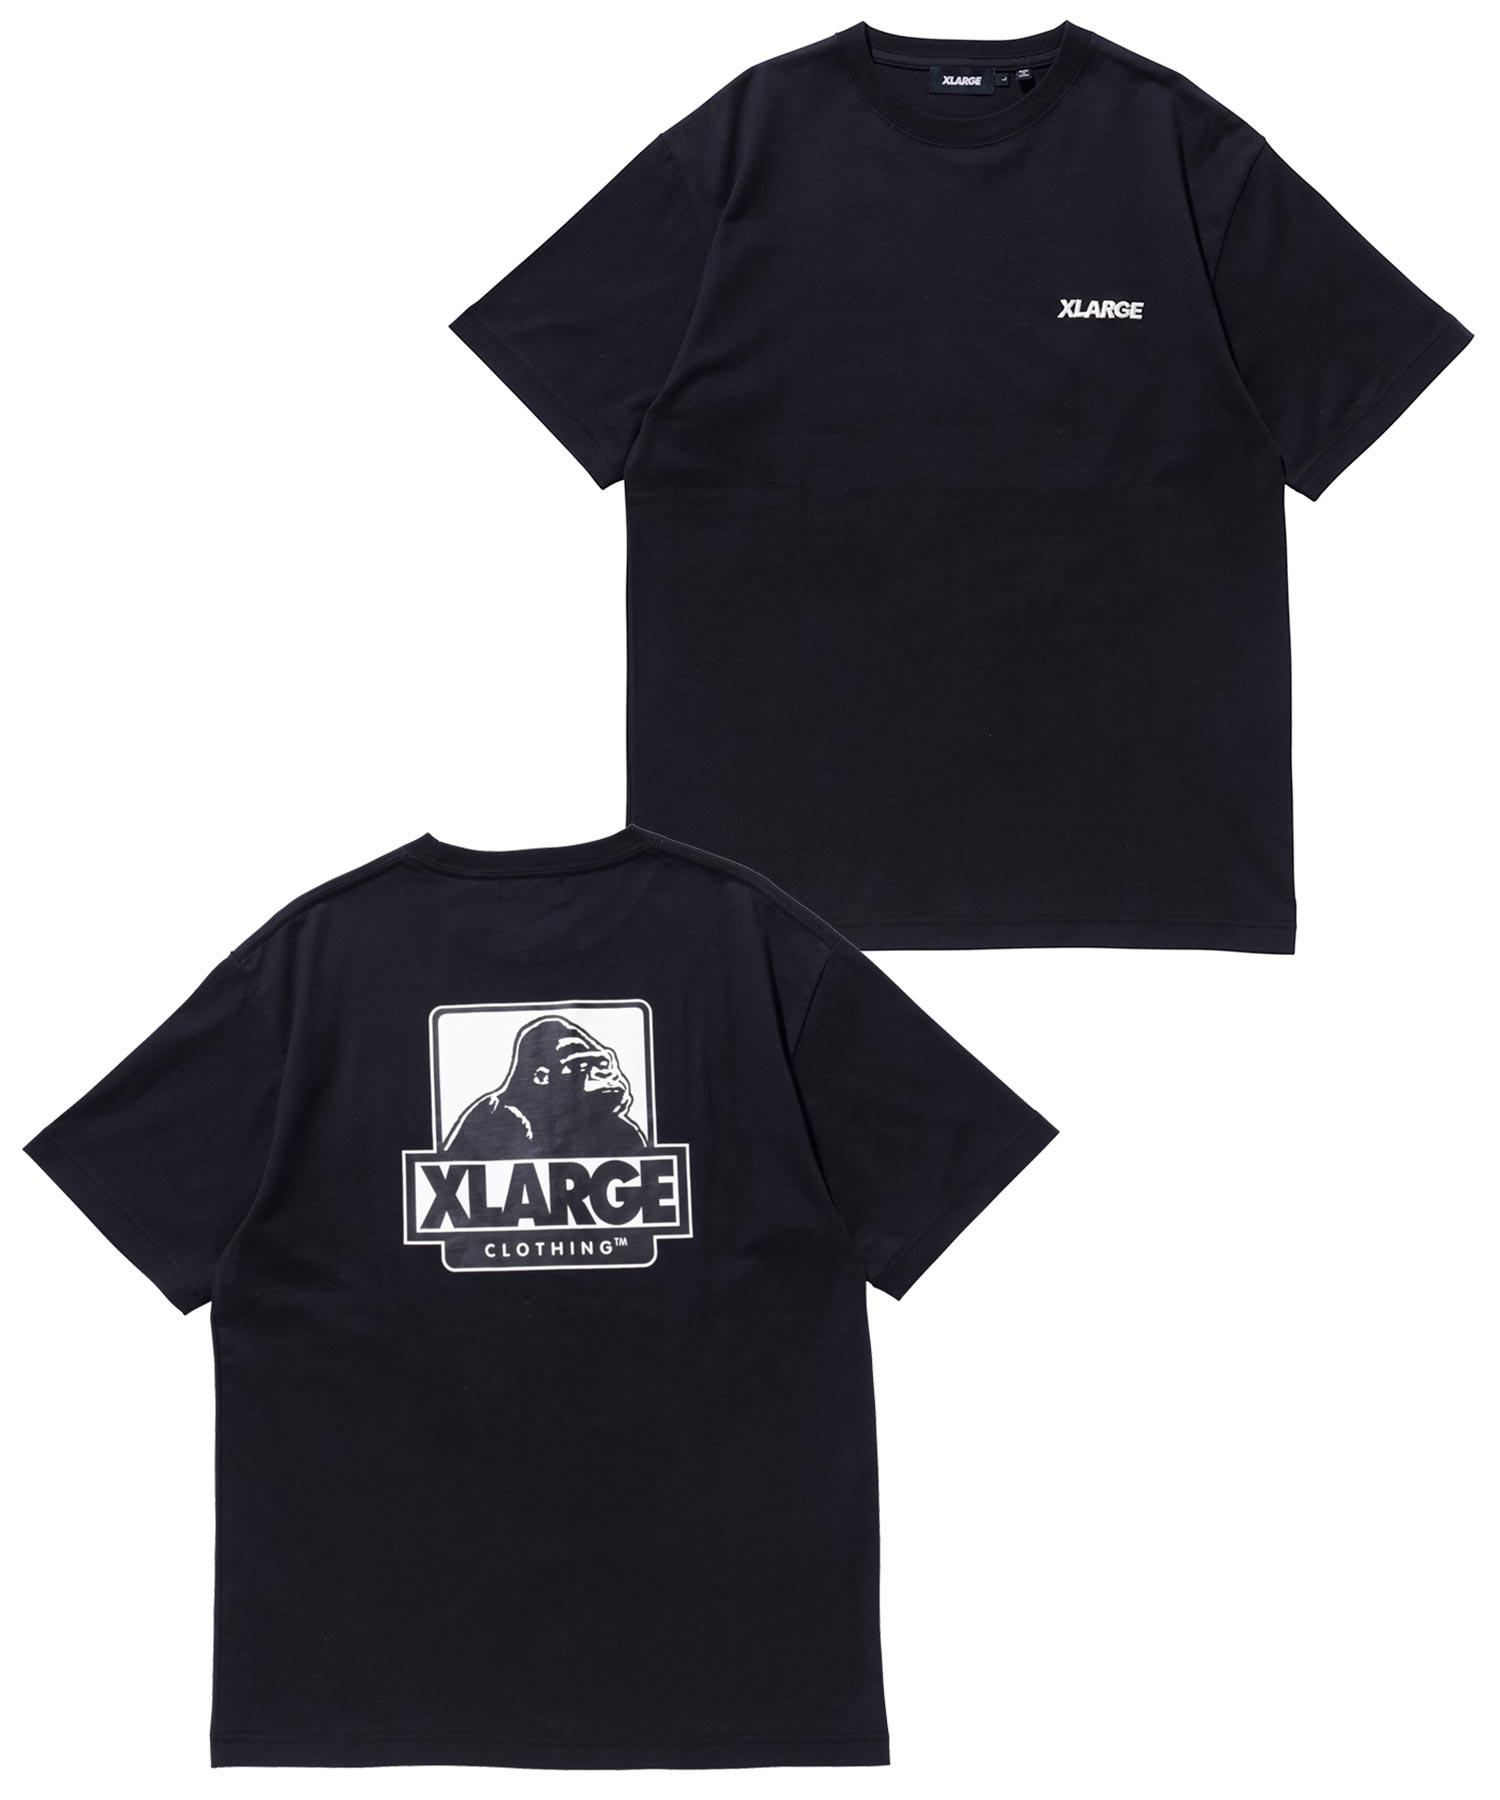 XLARGE(エクストララージ)通販|S/S TEE  OG(ブラック)